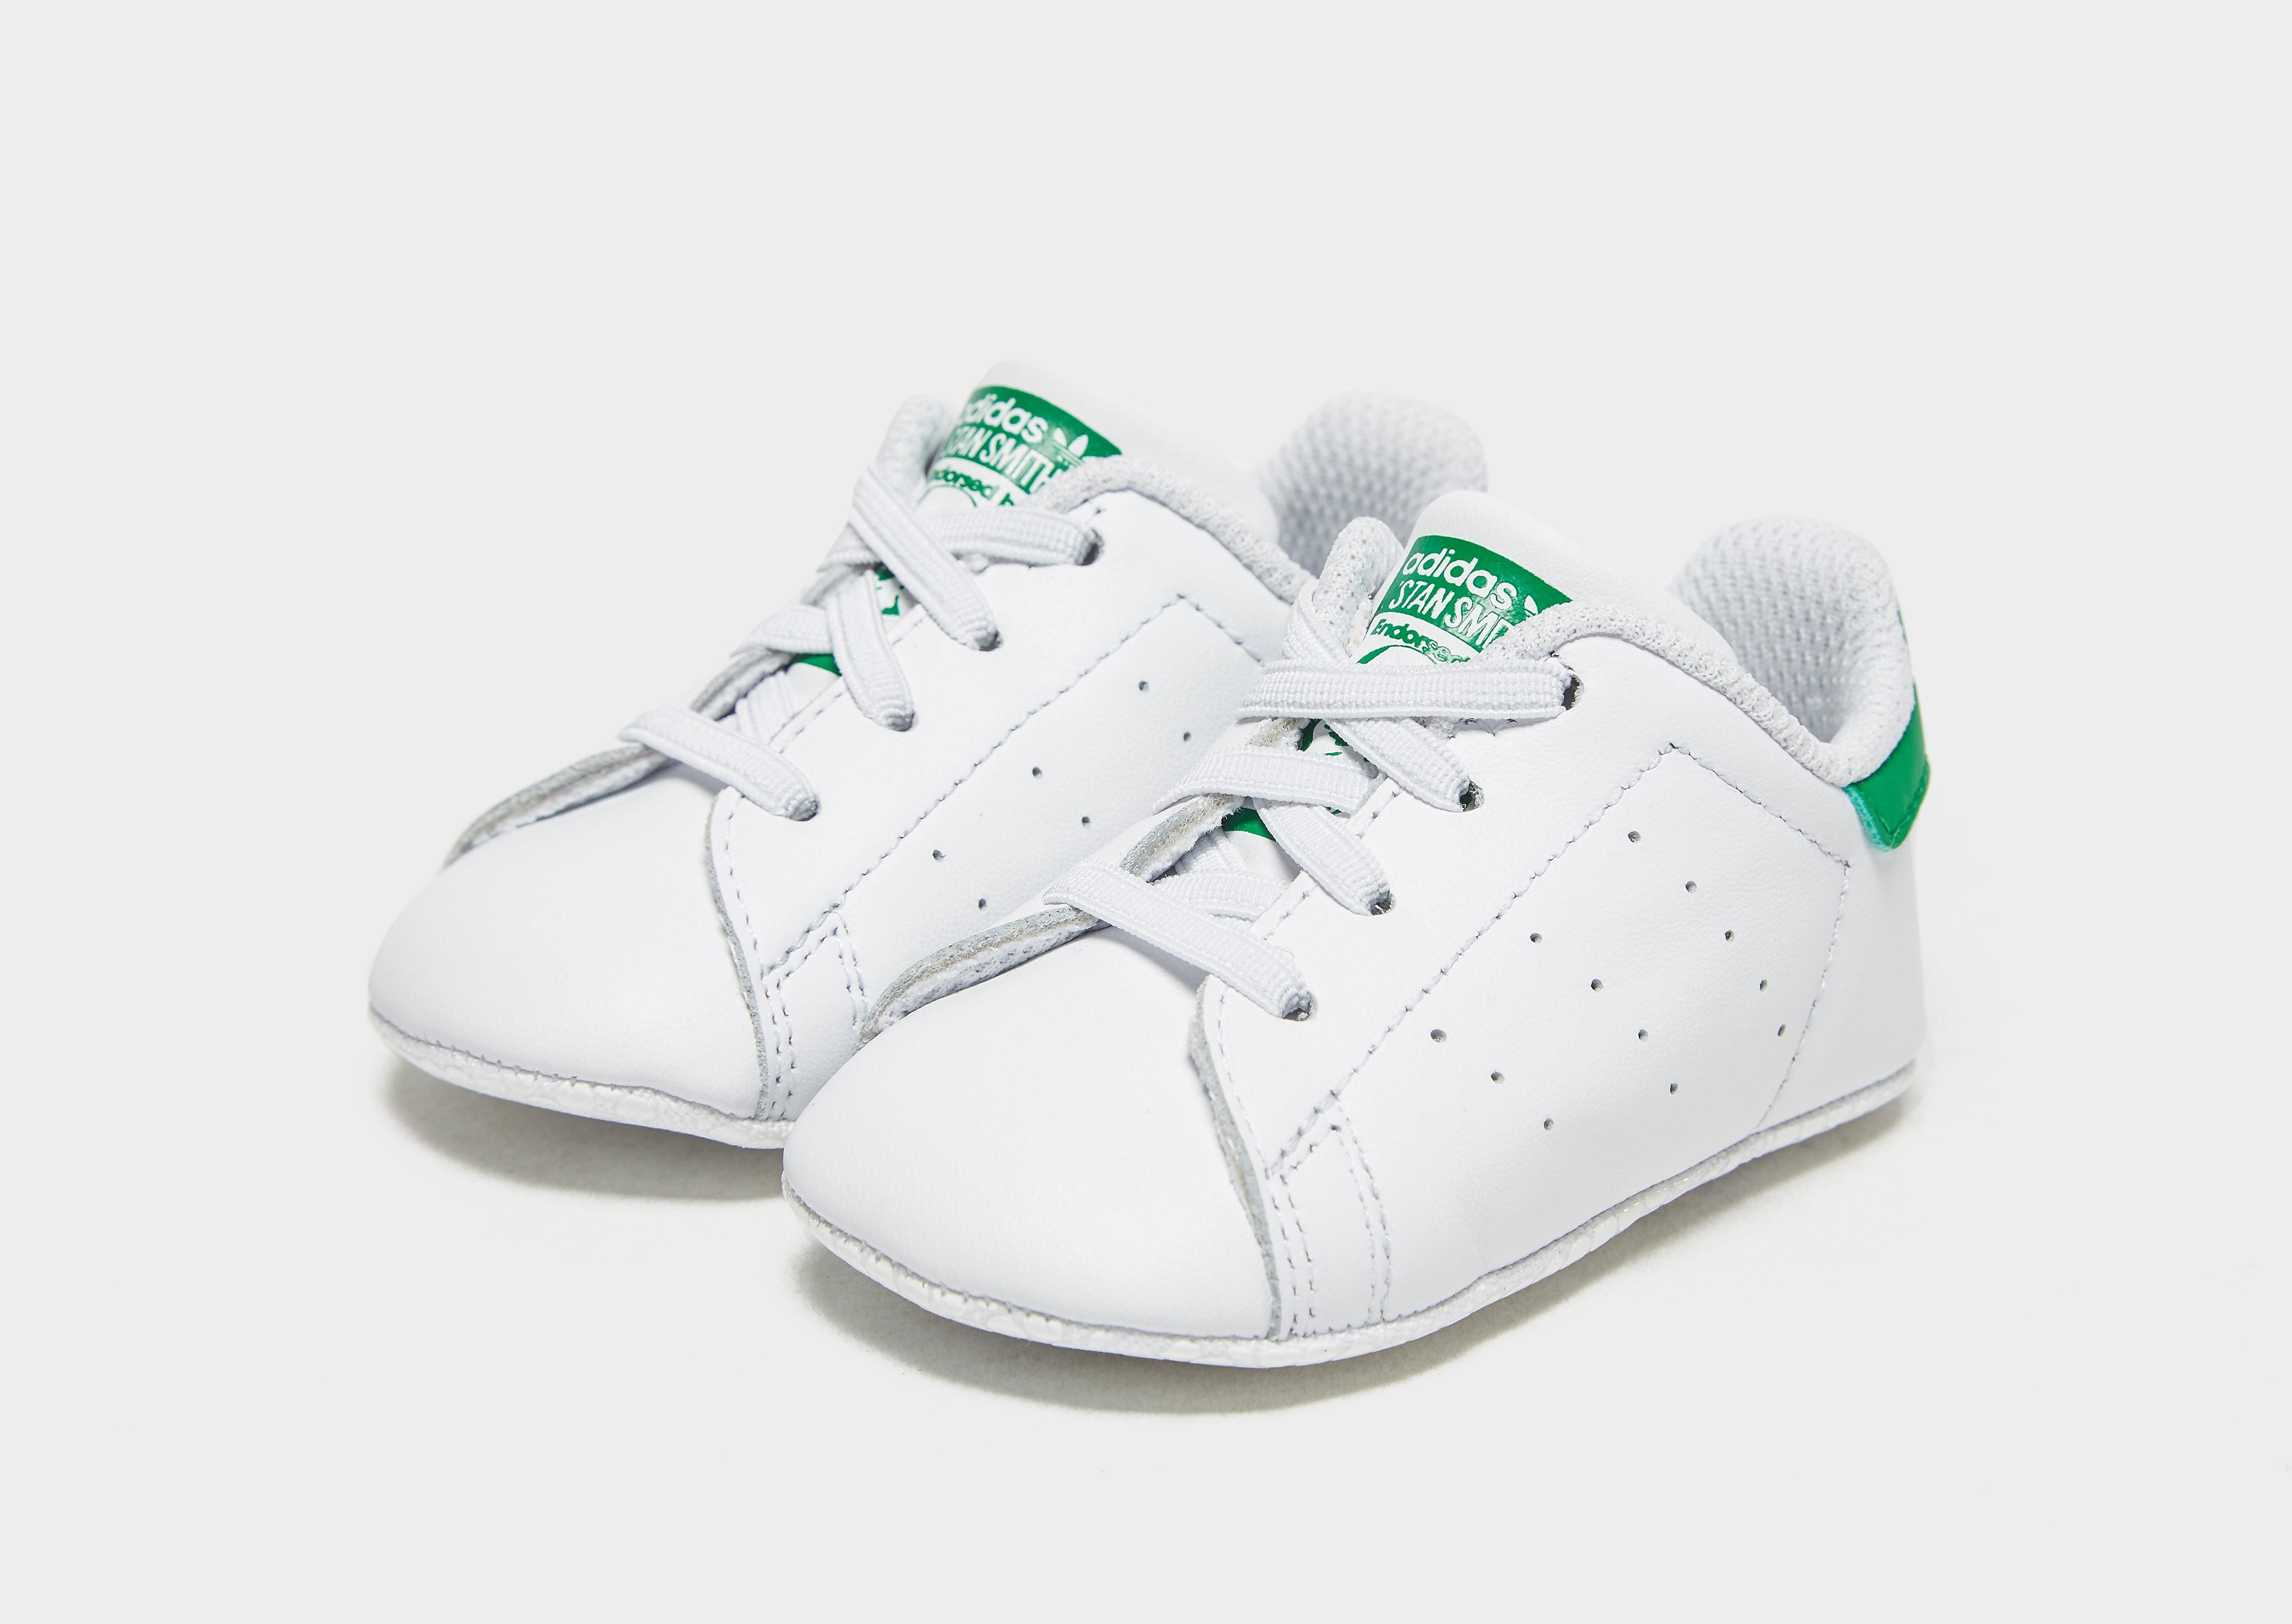 Adidas Stan Smith kindersneaker groen en wit